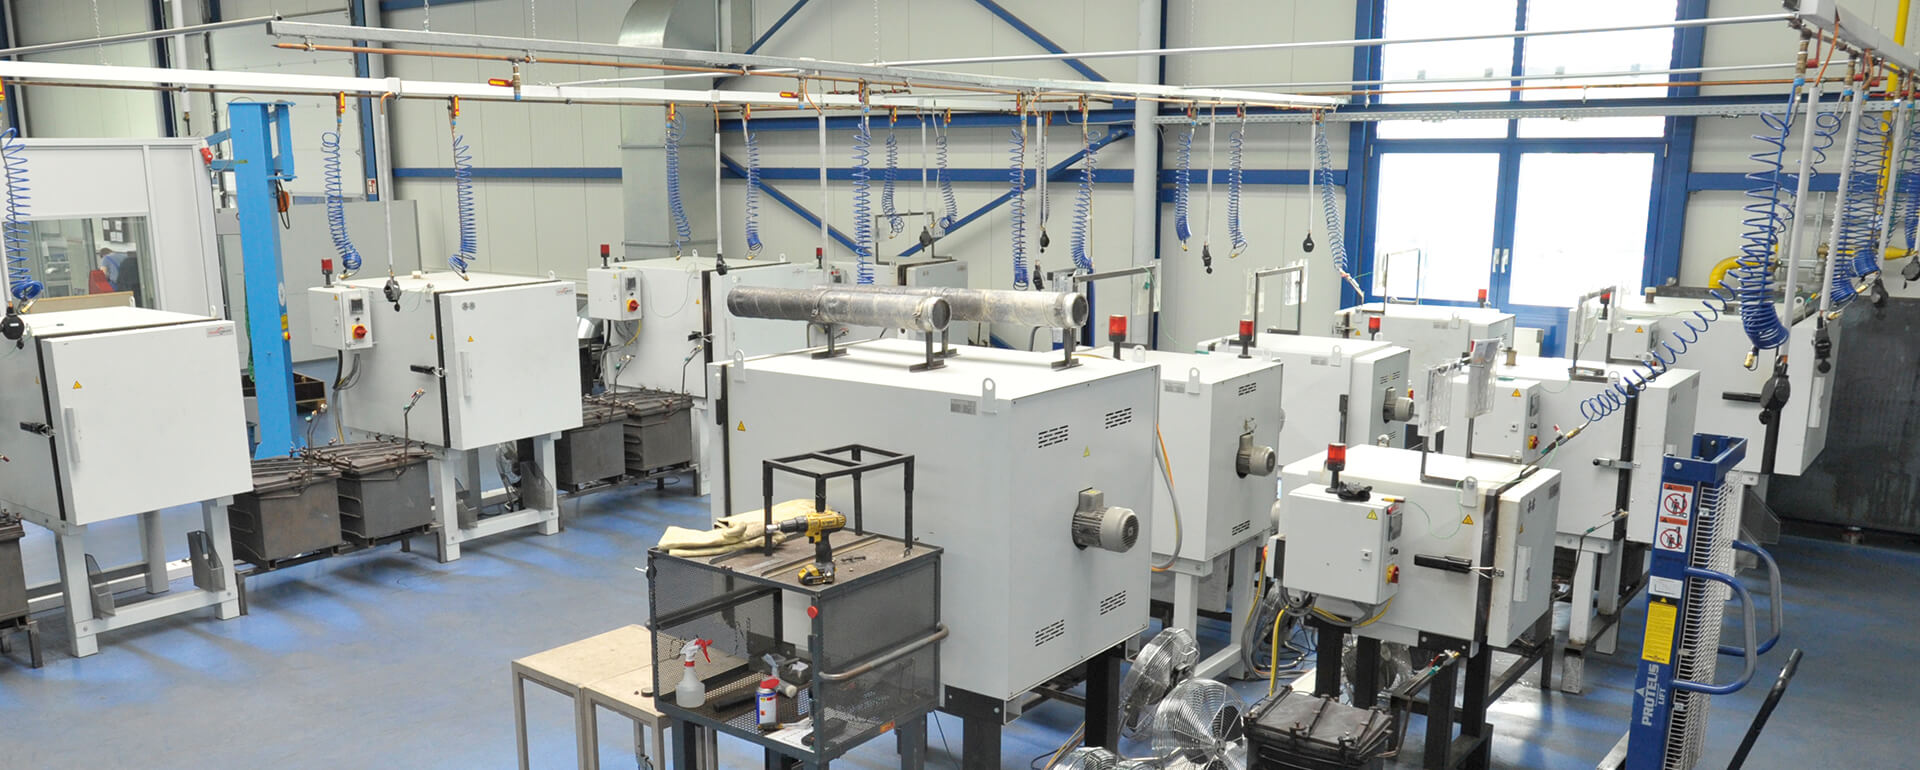 THERMCONCEPT Industrieofenbau